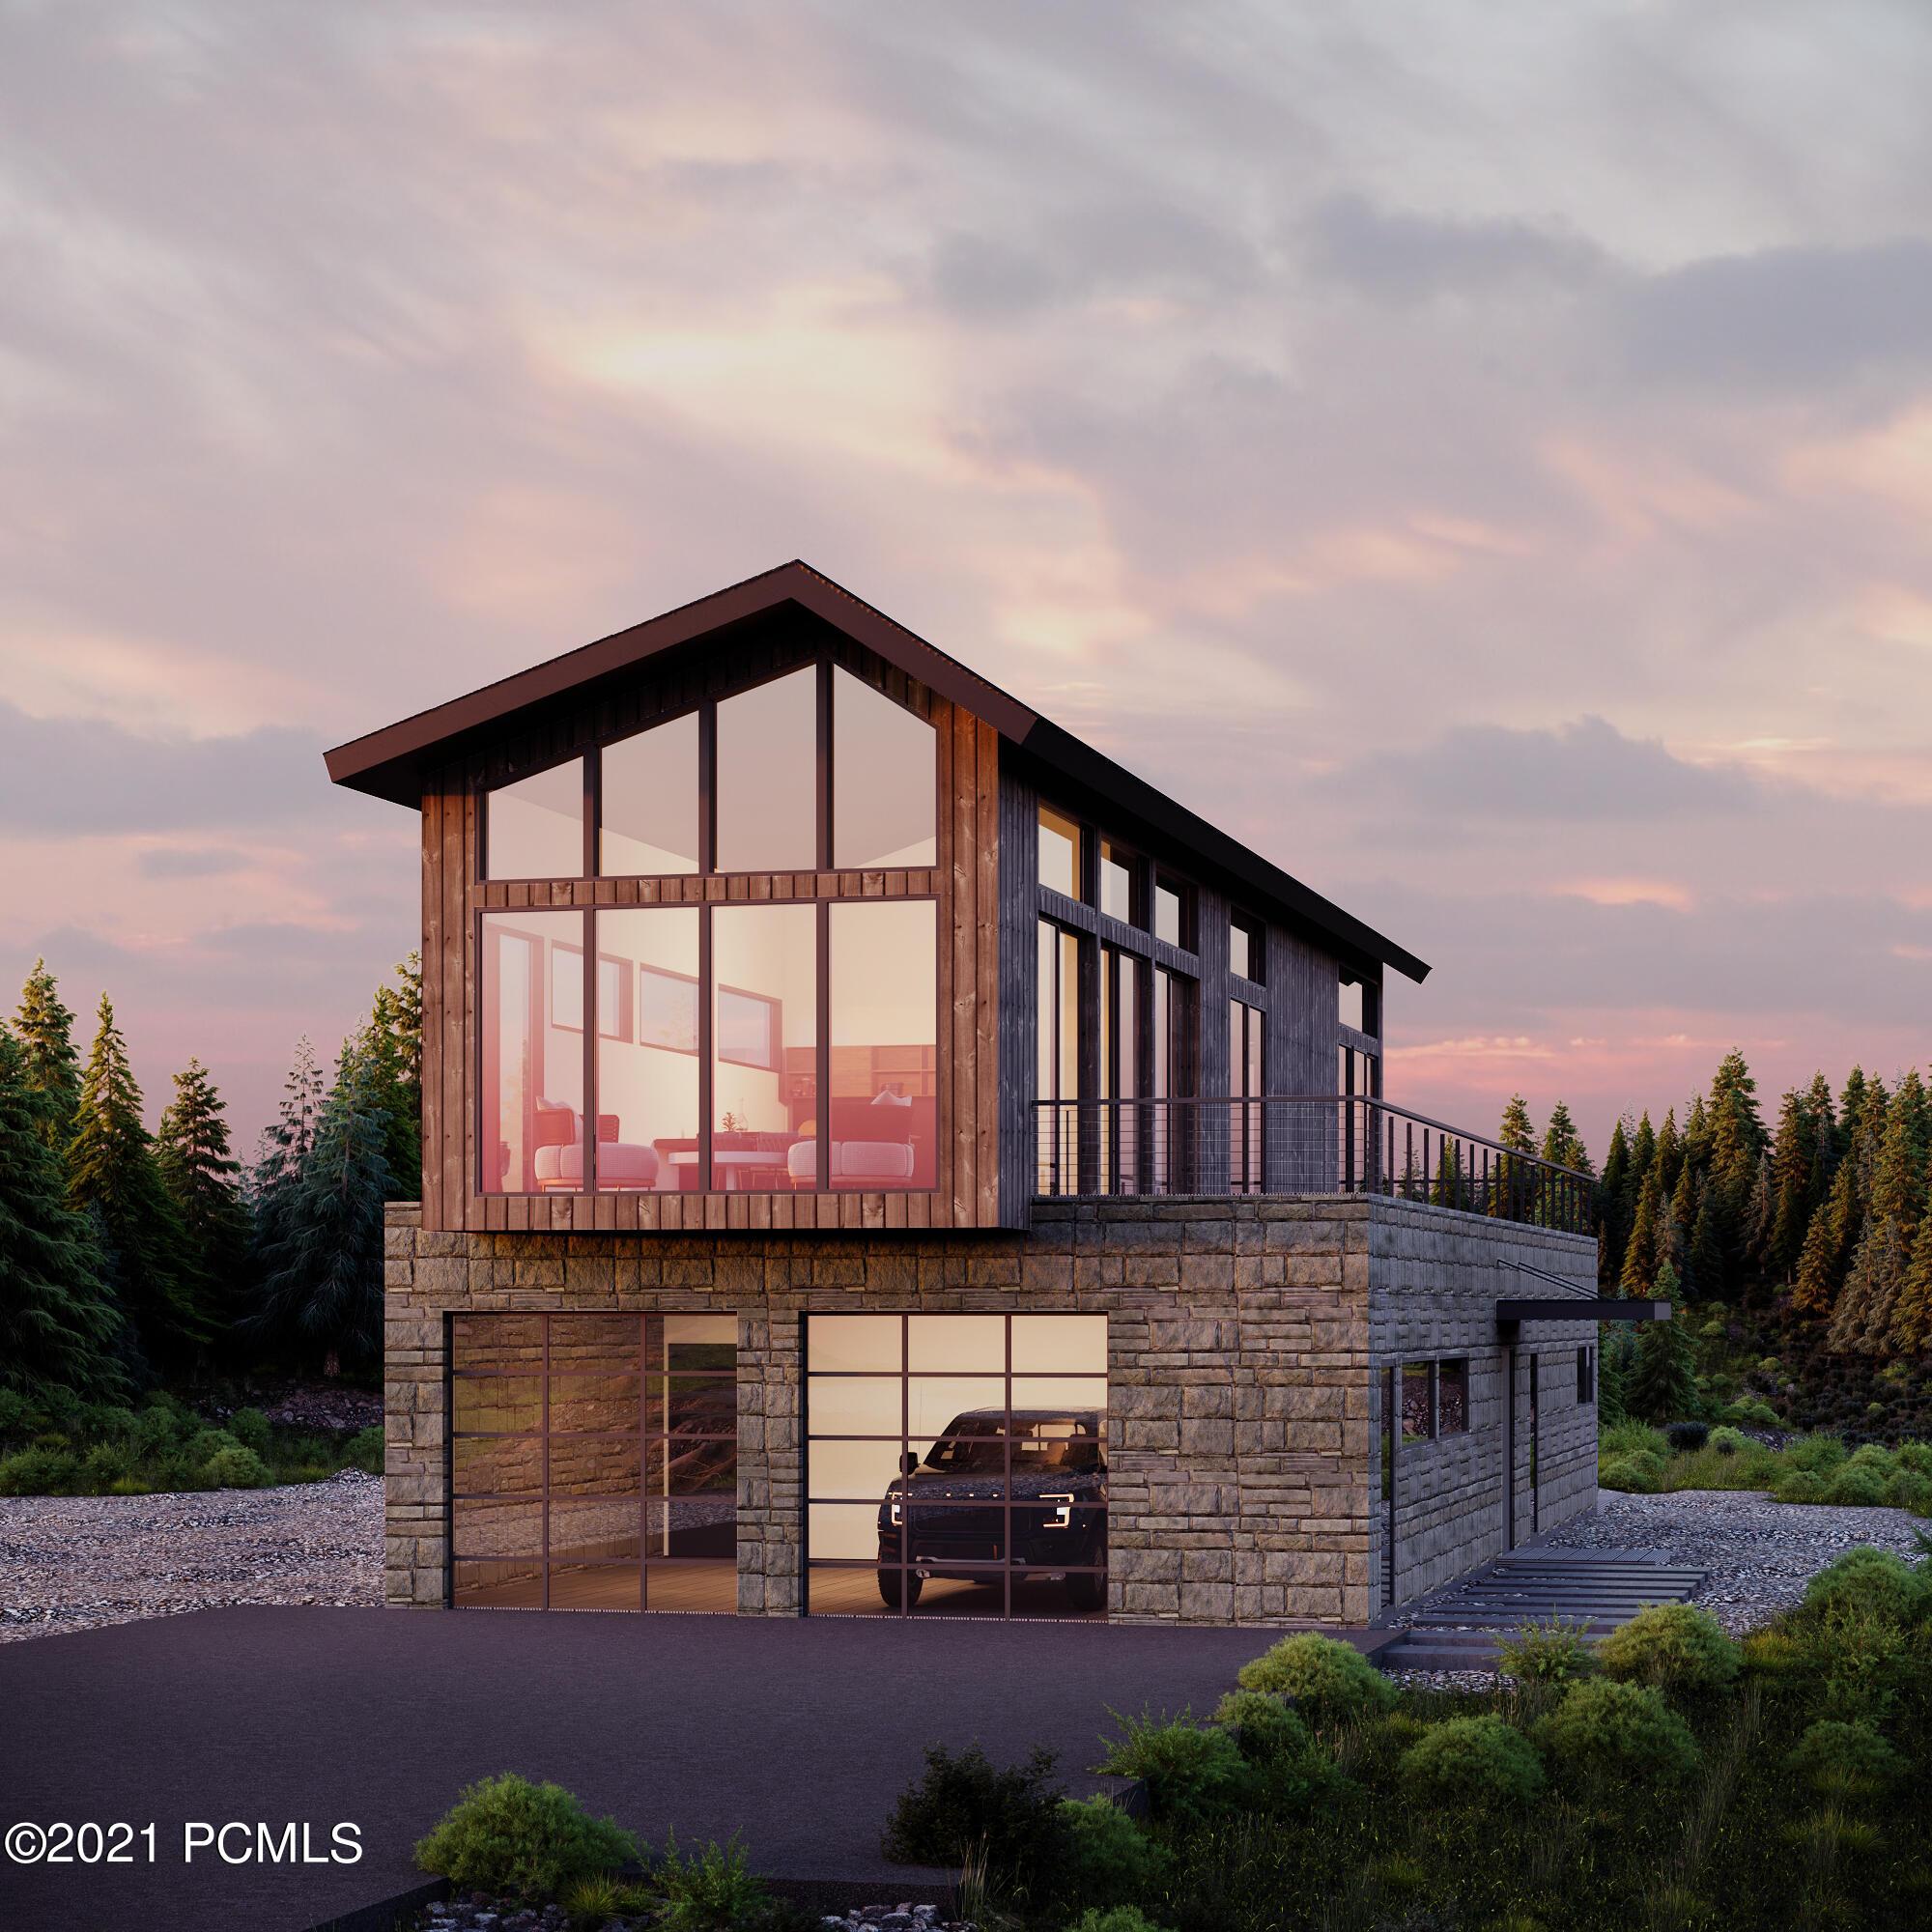 3822 Islay Drive, Heber City, Utah 84032, 4 Bedrooms Bedrooms, ,4 BathroomsBathrooms,Single Family,For Sale,Islay,12104206